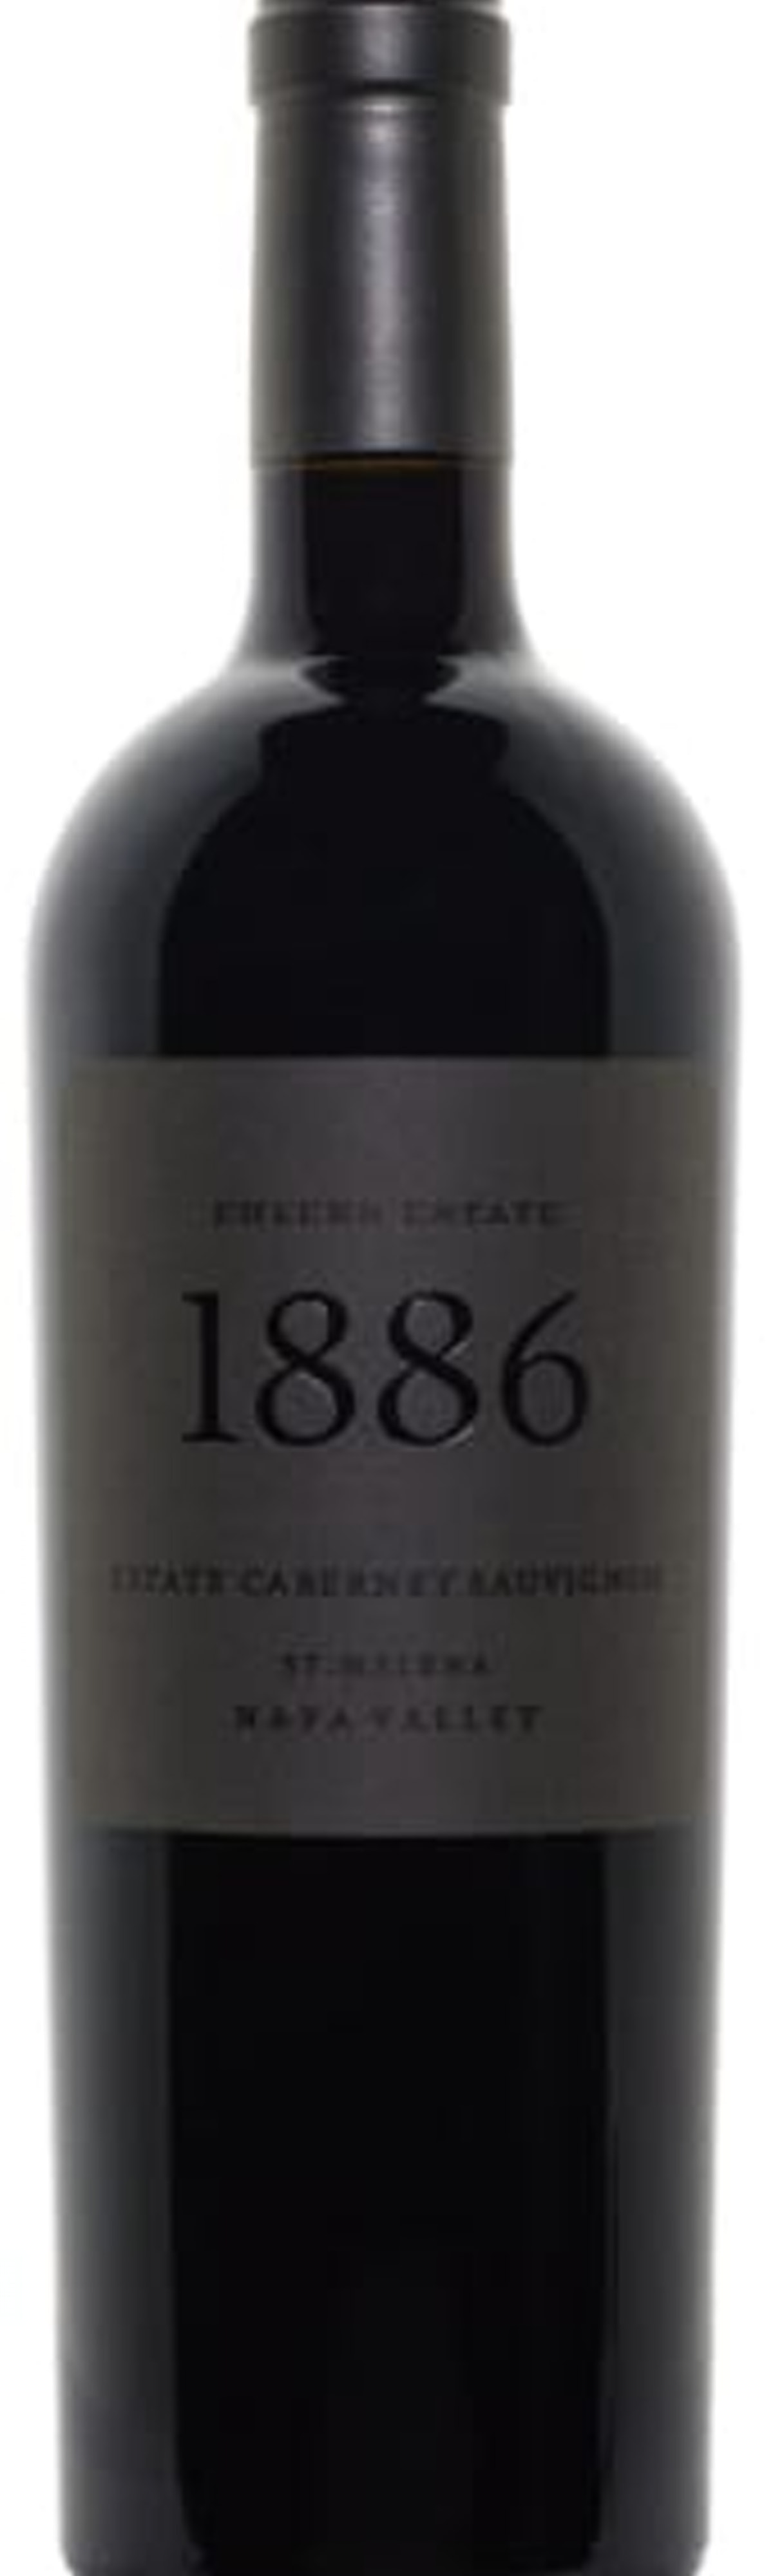 Cabernet Sauvignon 1886 2014